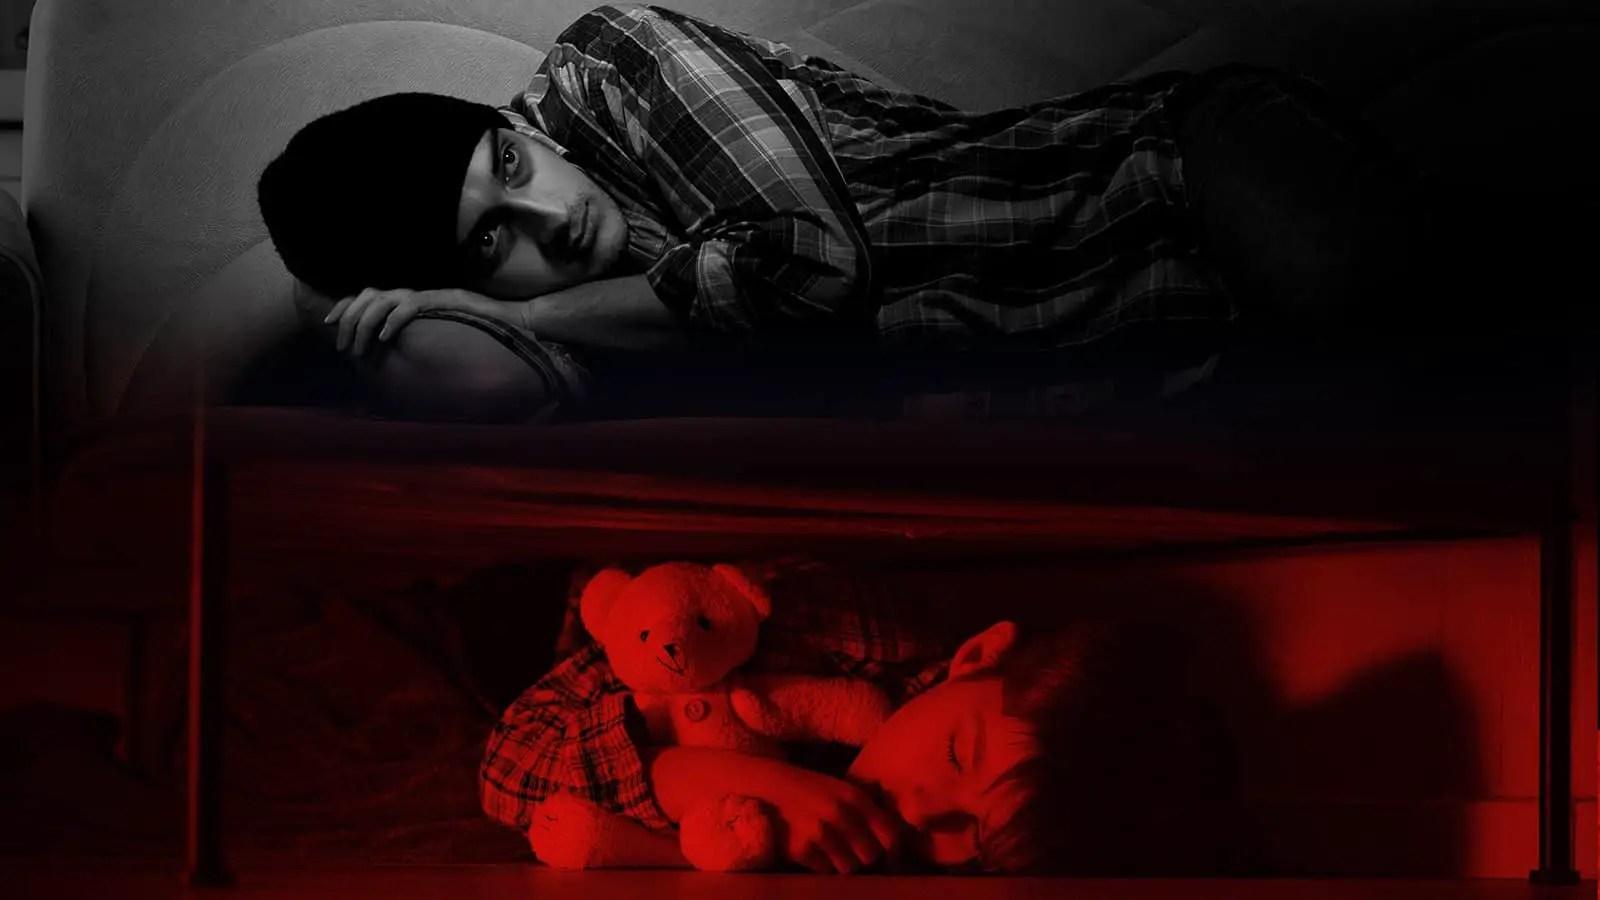 6 Major Ways Childhood Trauma Impacts Us During Adulthood